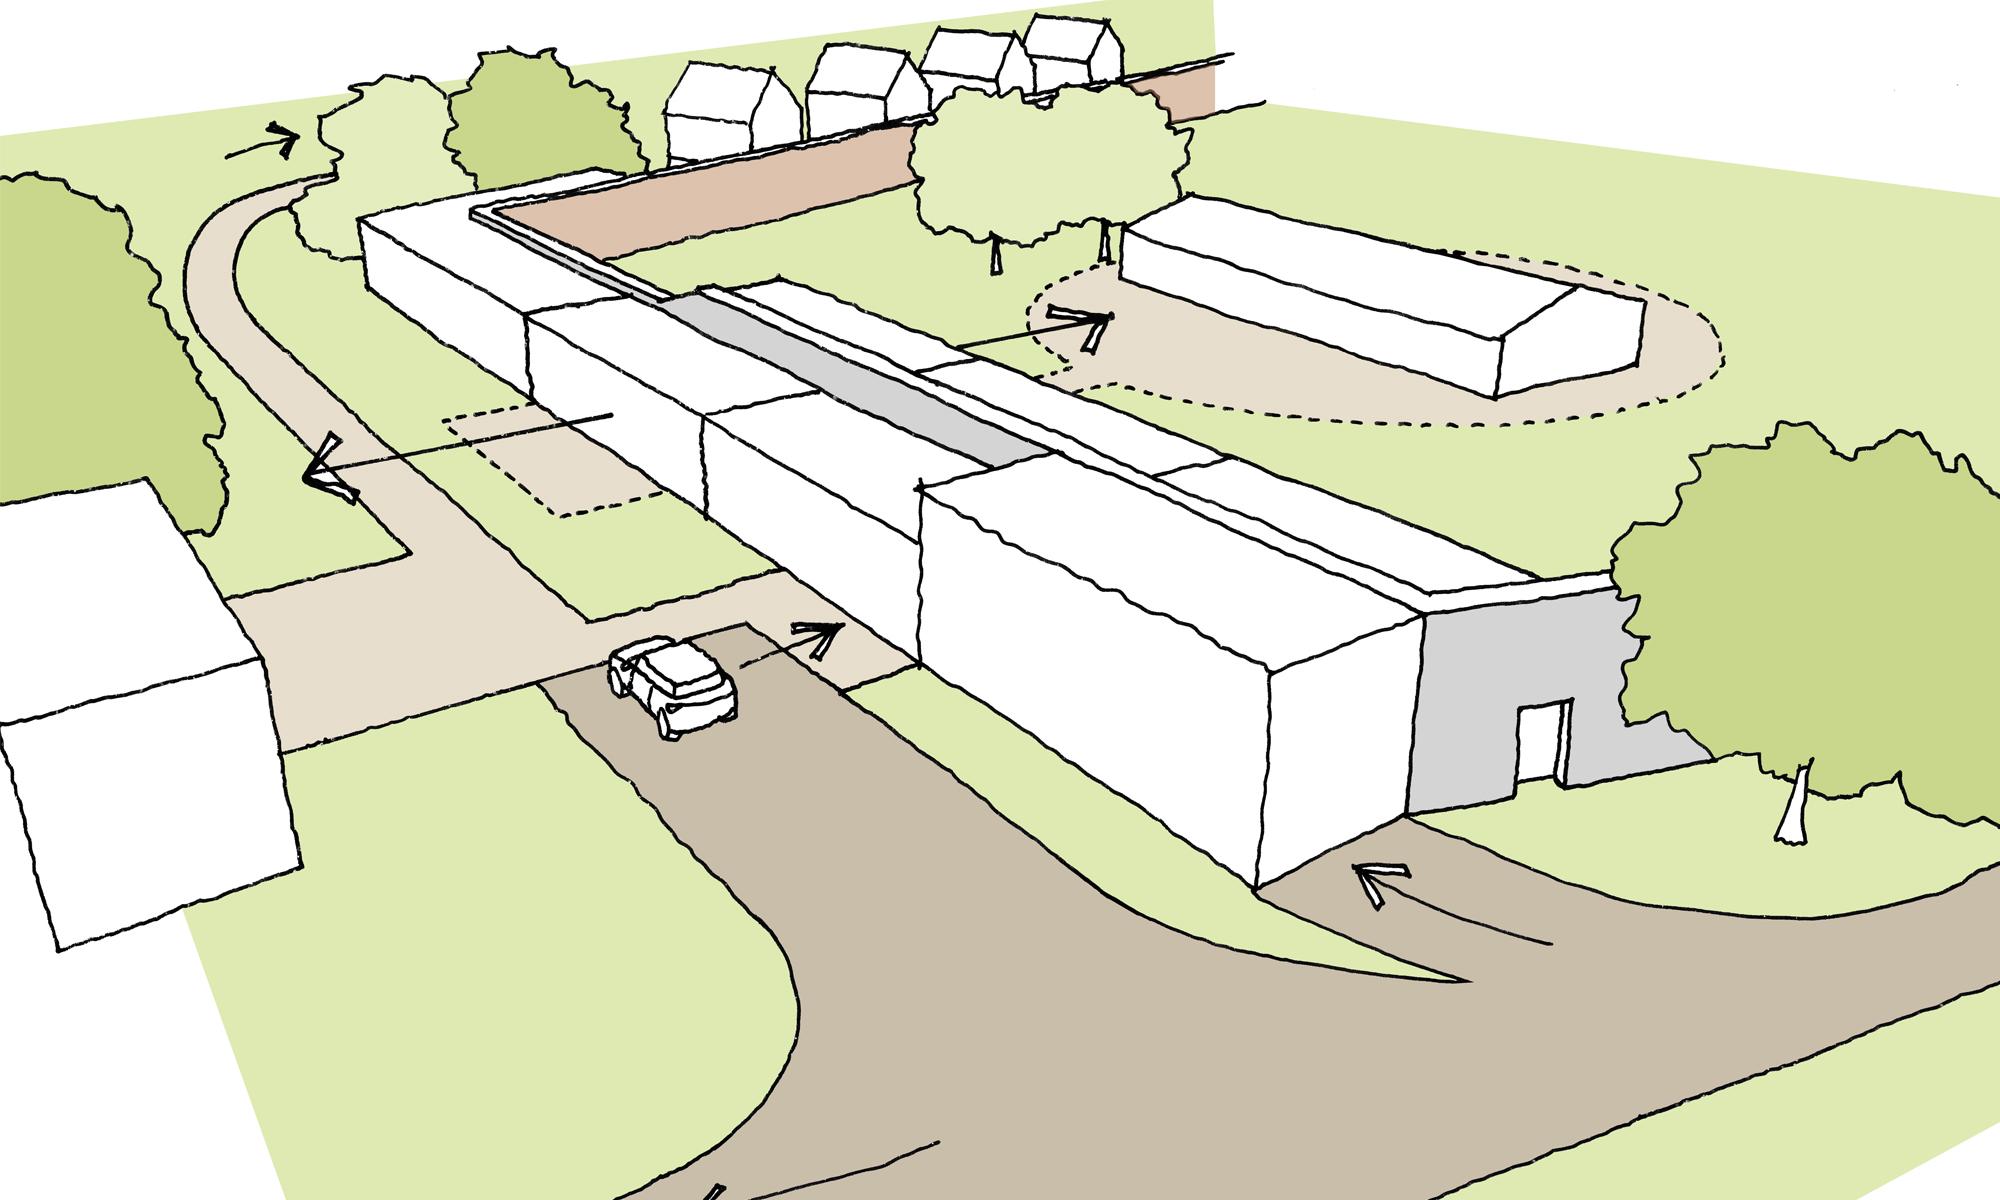 Hesleyside Walled Garden Sketch Communal Area